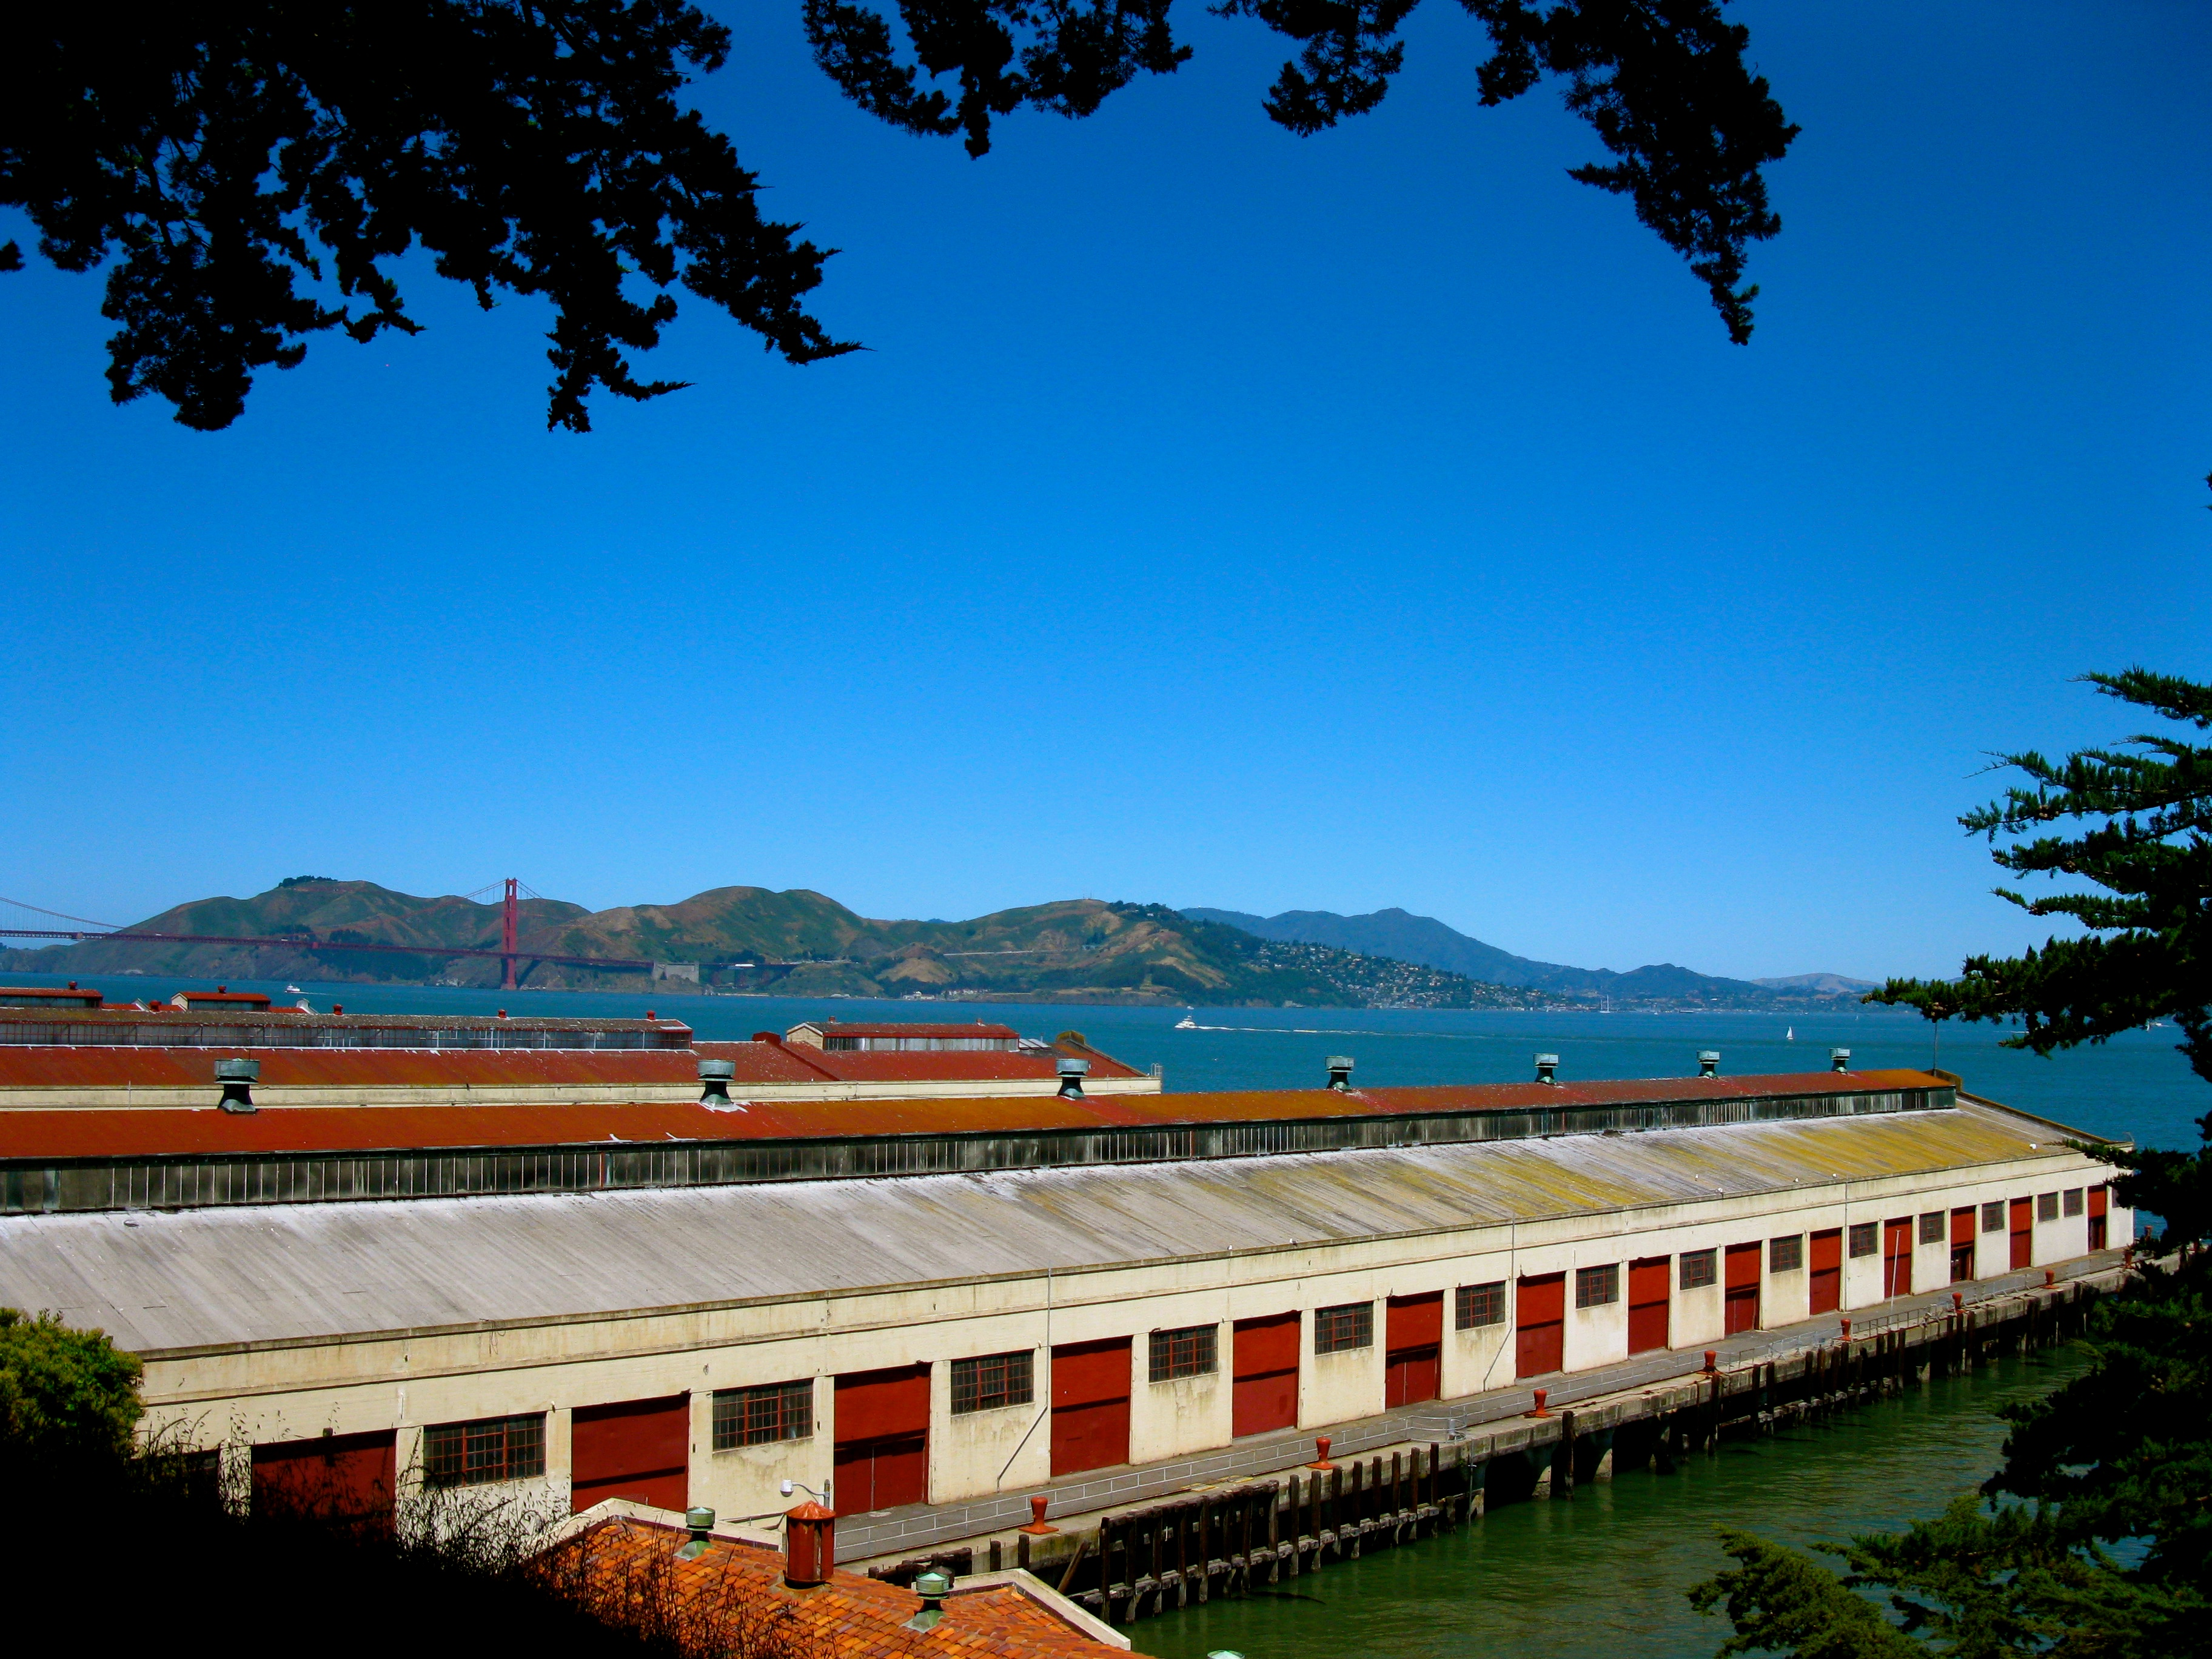 Fort Mason Center, San Francisco